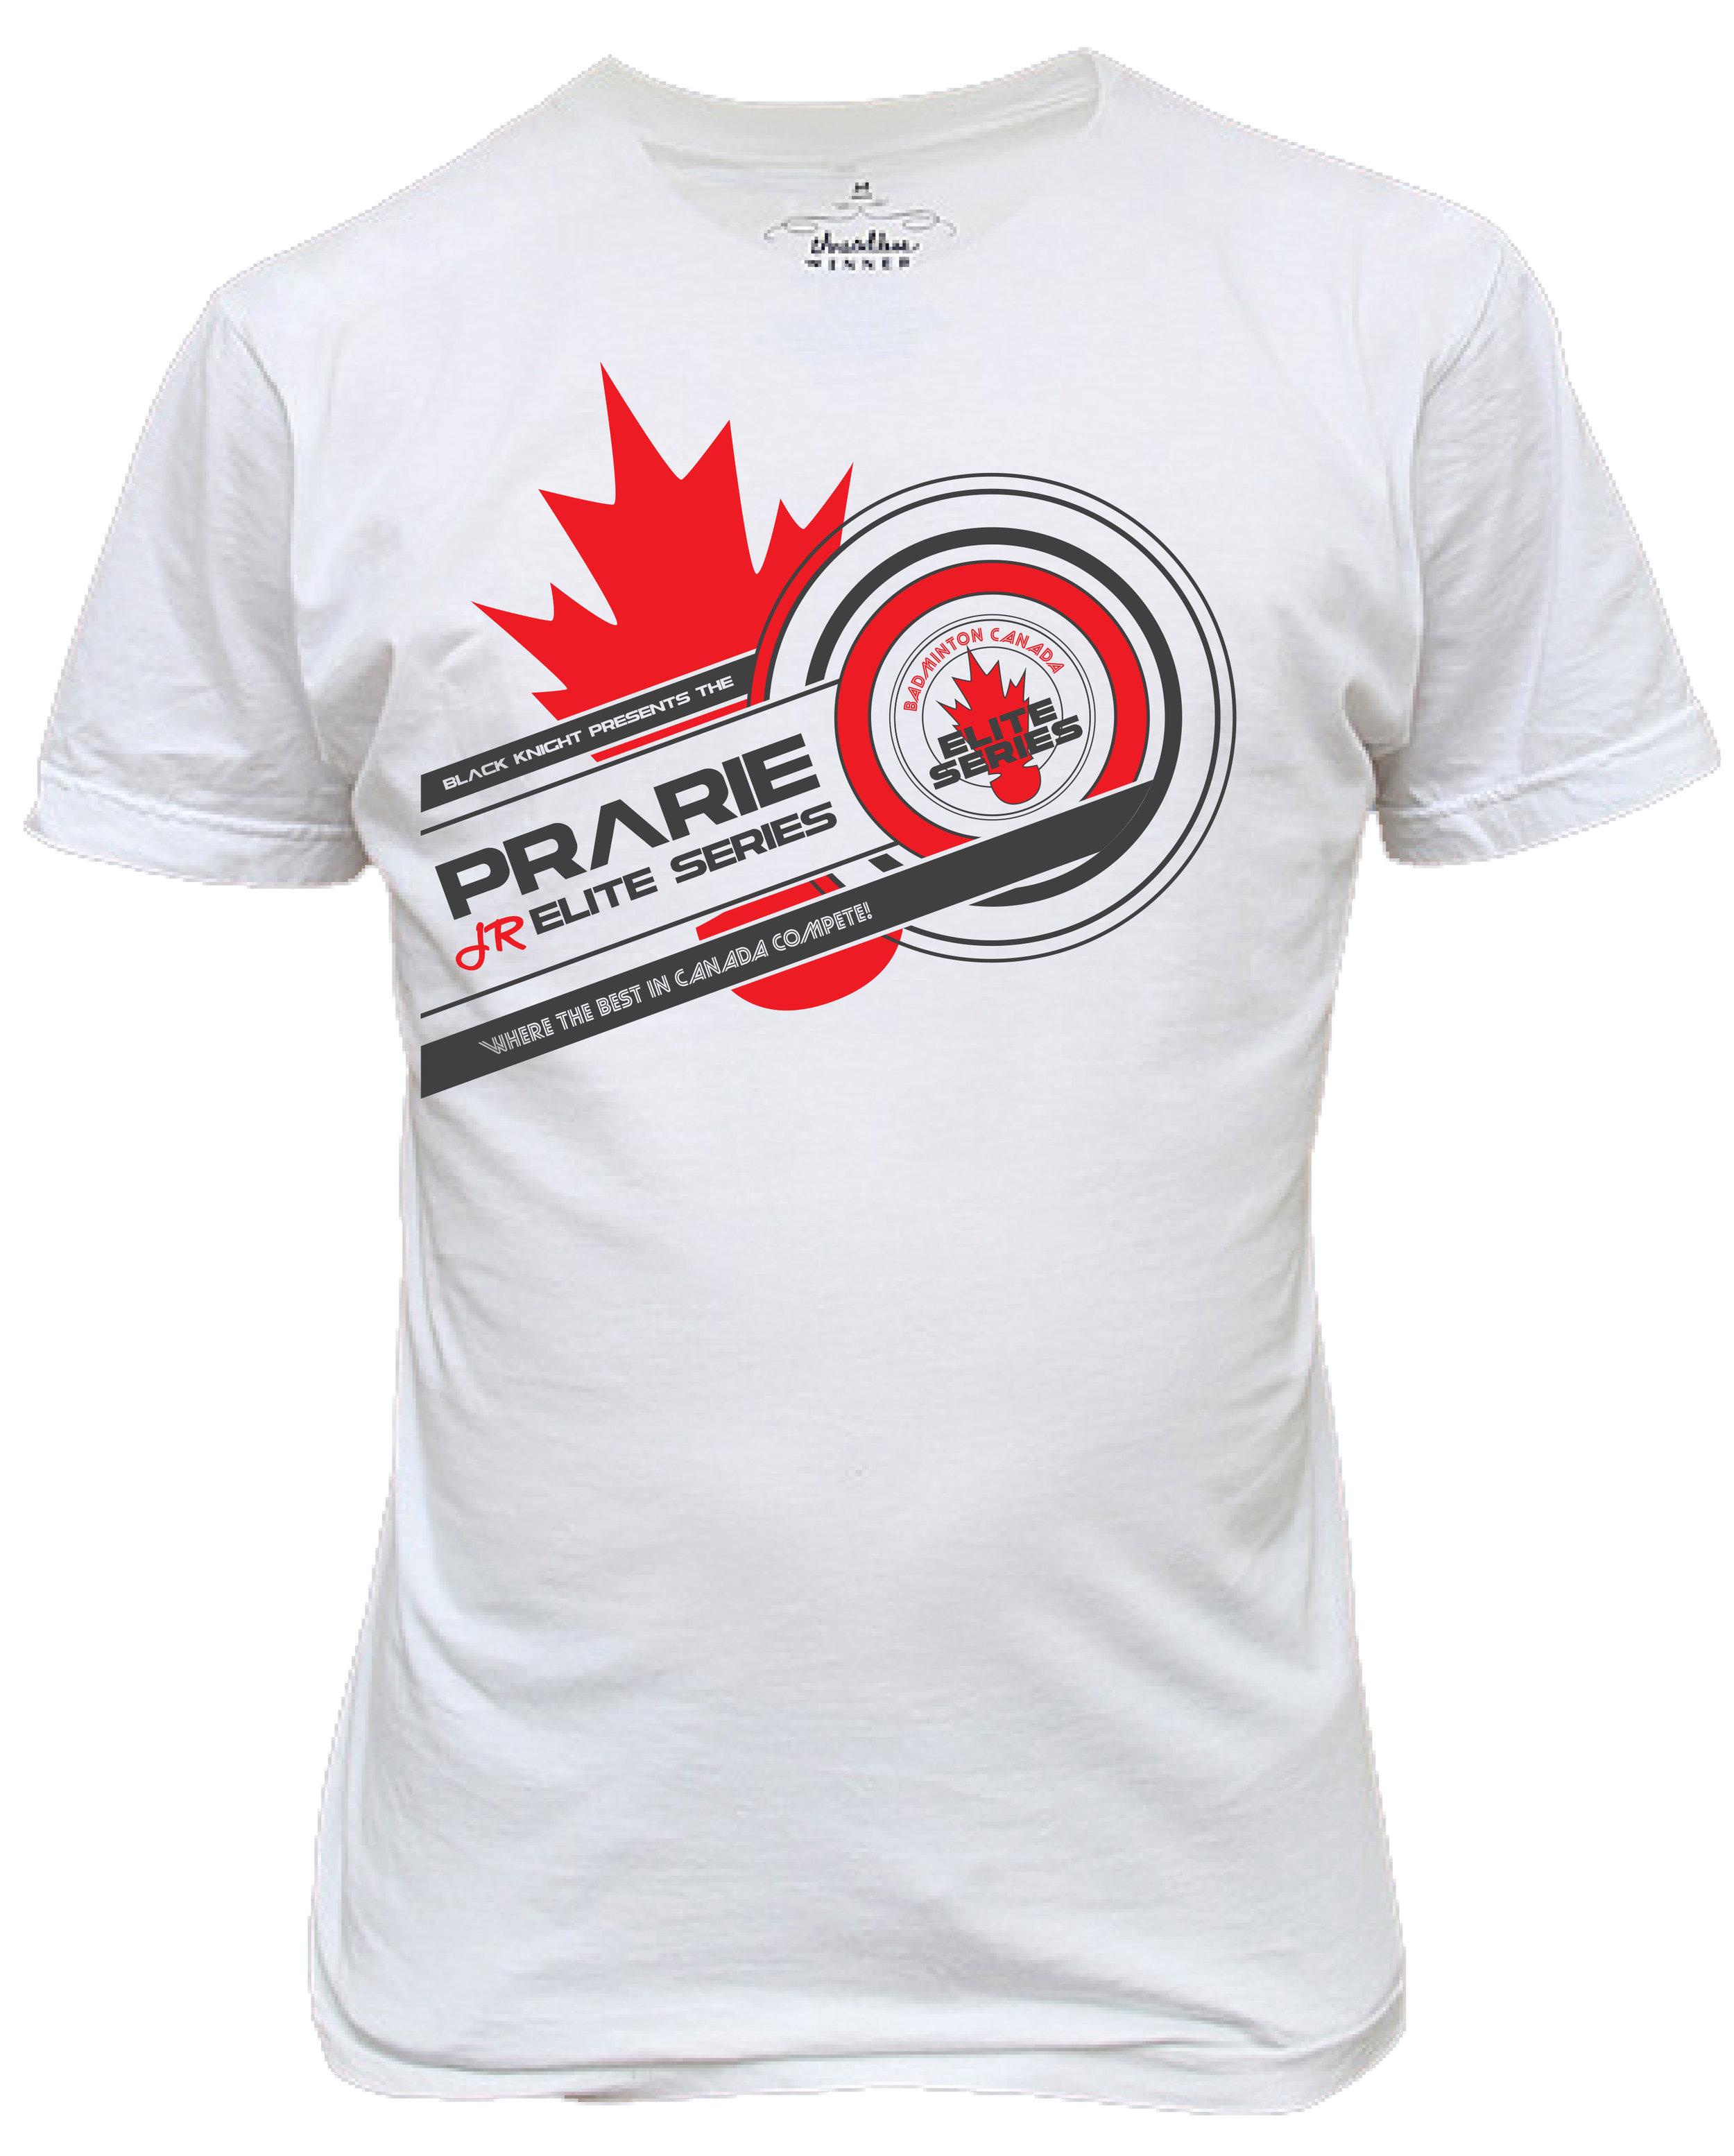 Elite Series T-shirt-2.jpg